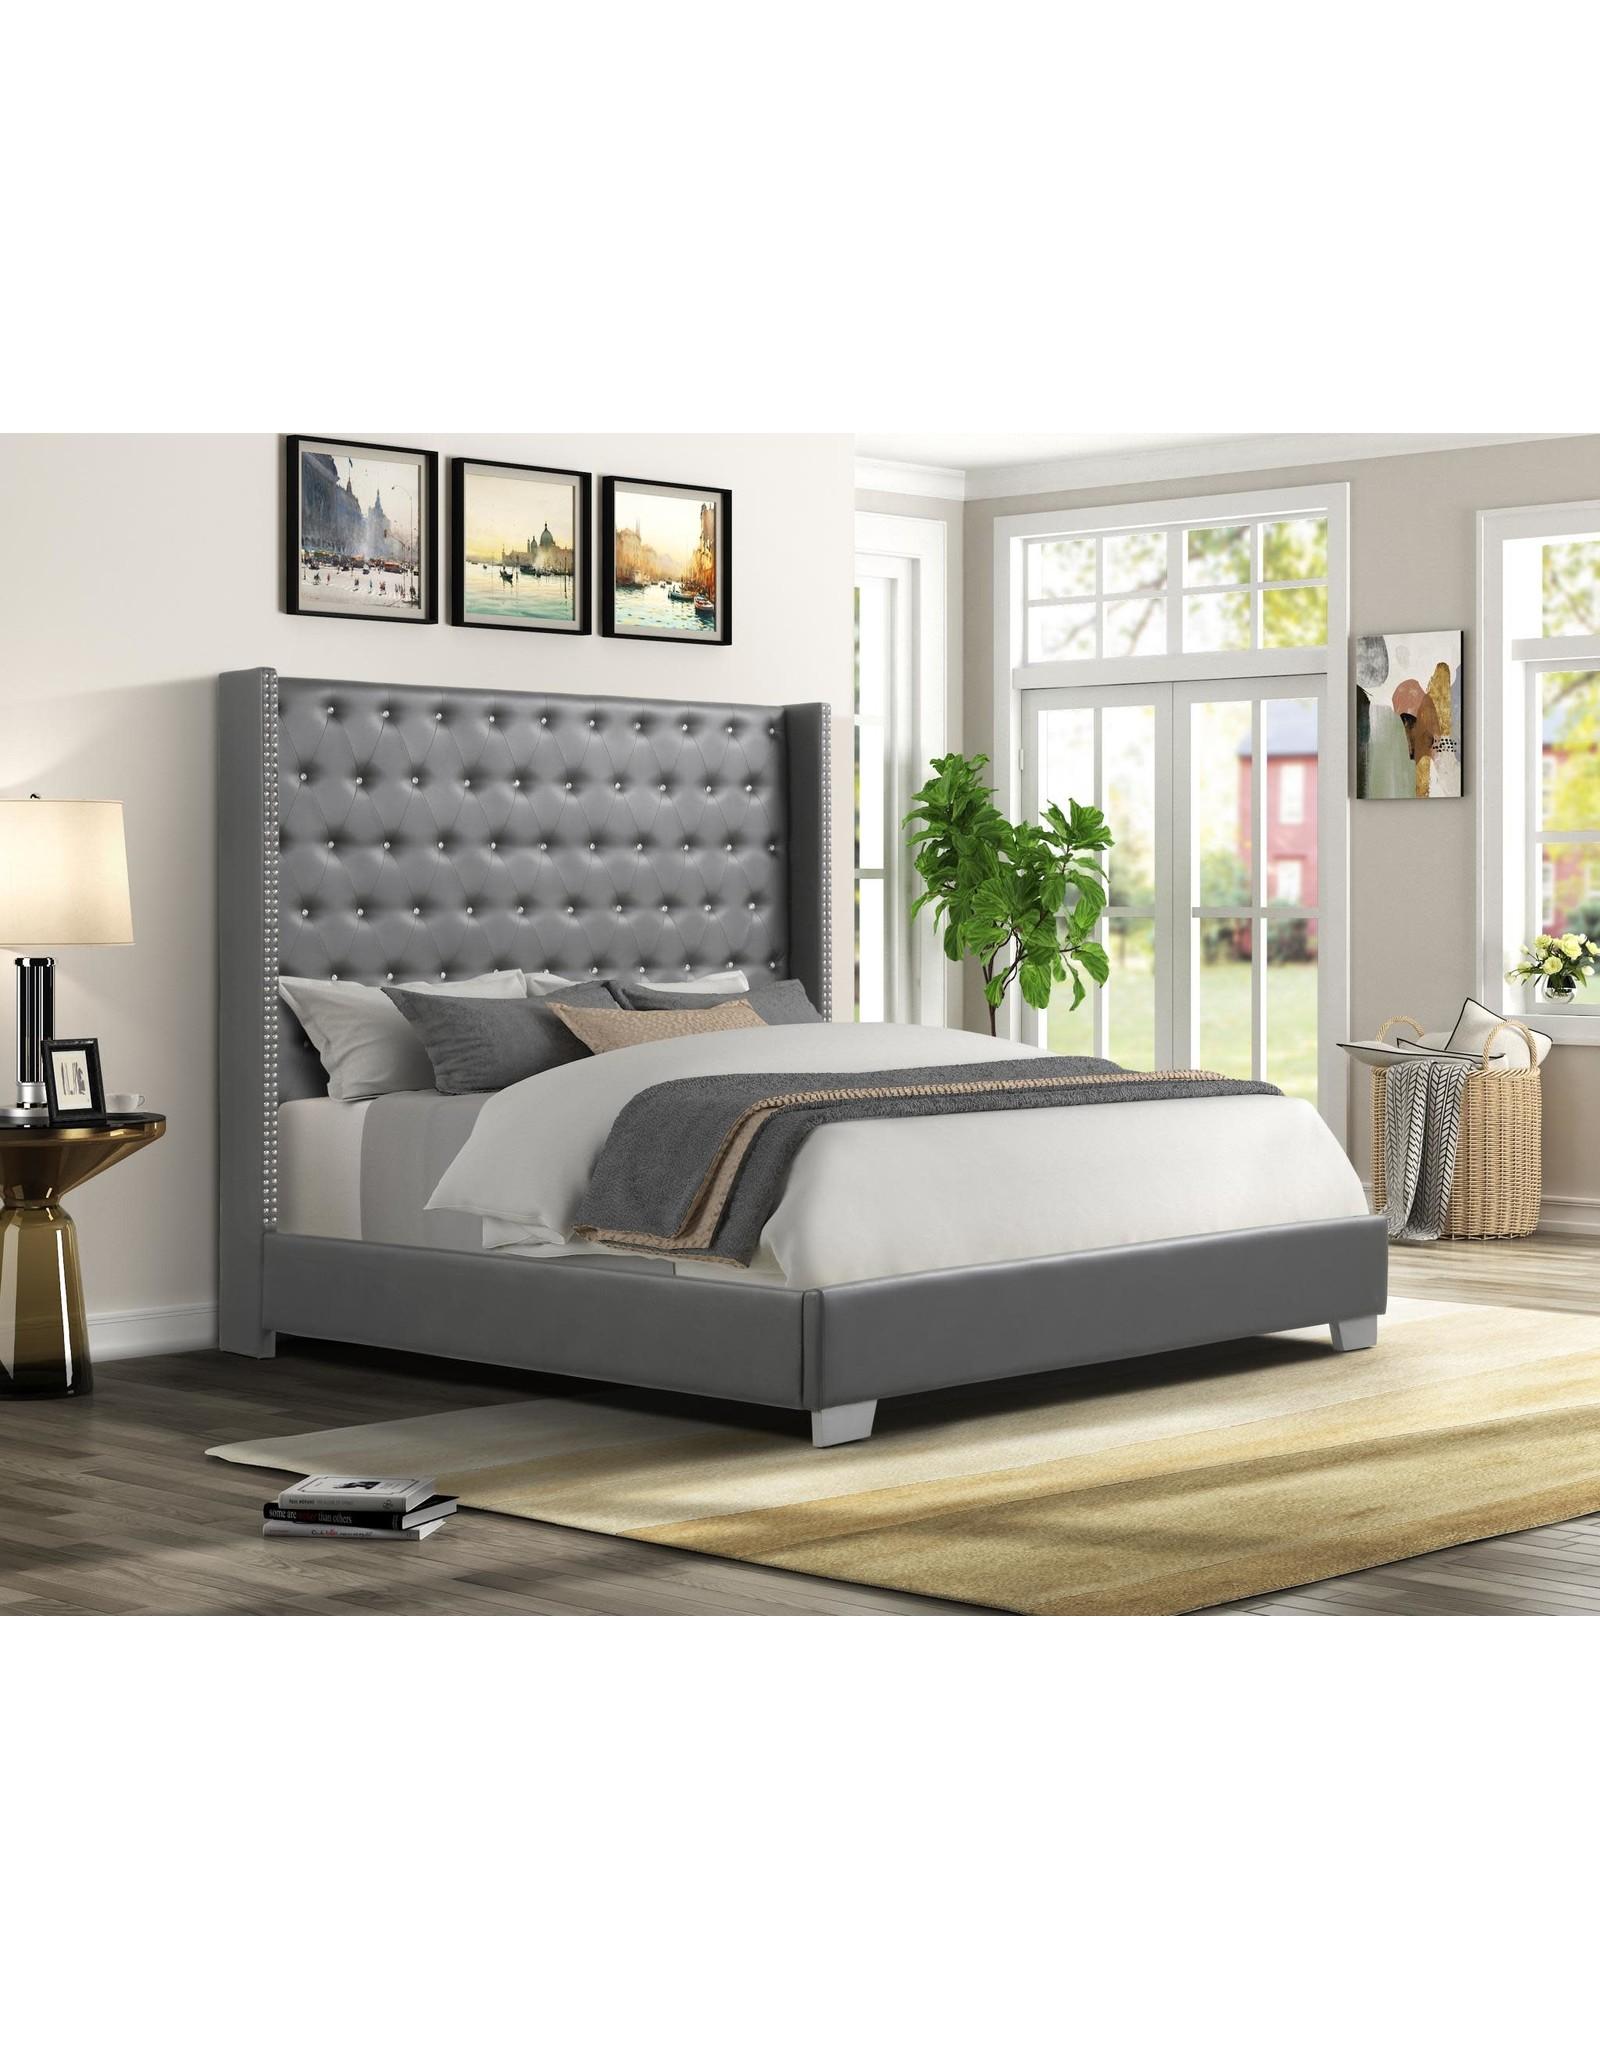 AL8027 King Bed Gray